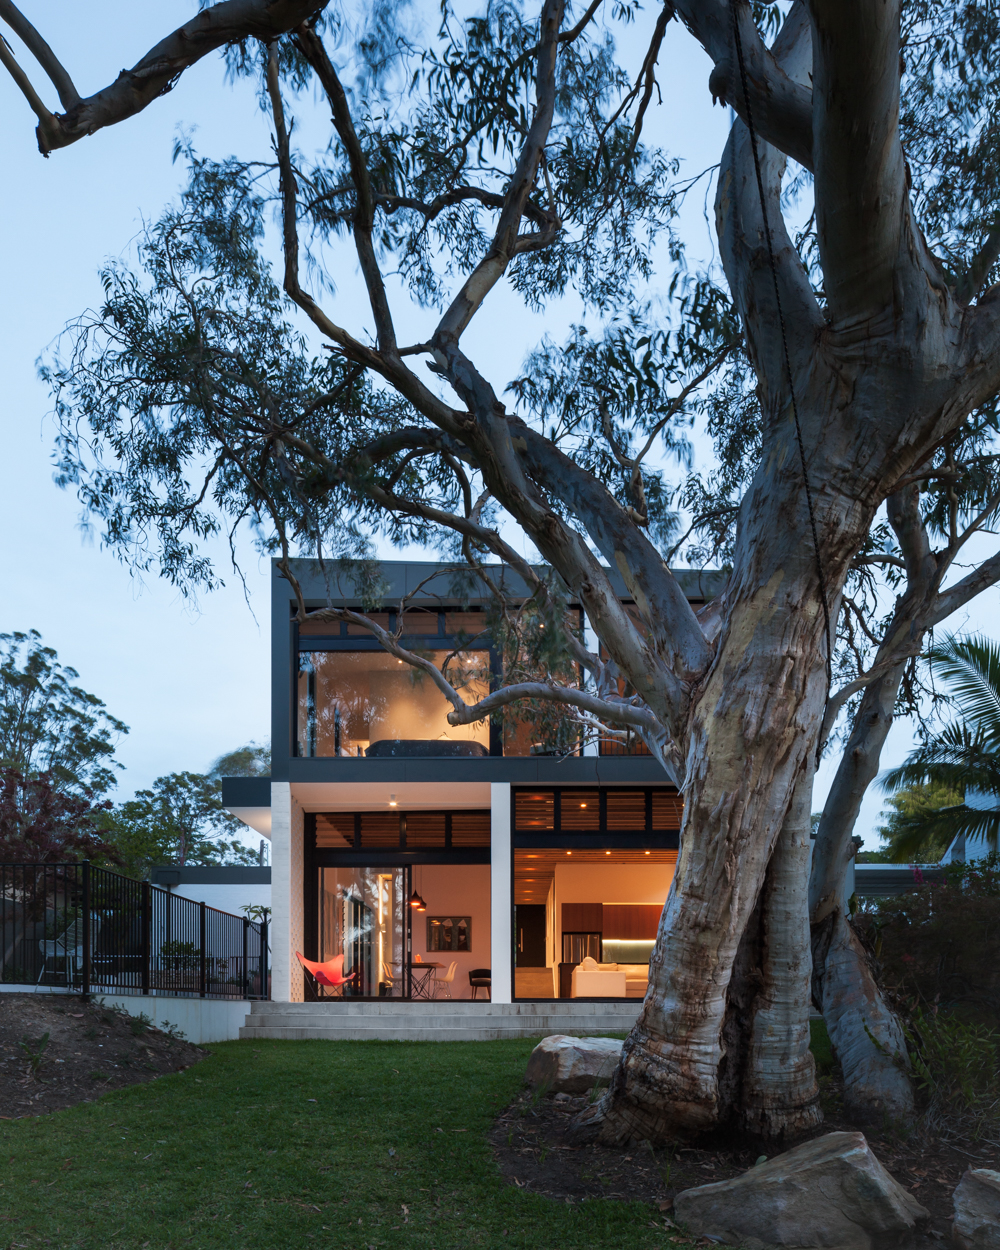 turramurra-house=noxon-giffen-architects-the-design-emotive--2.jpg